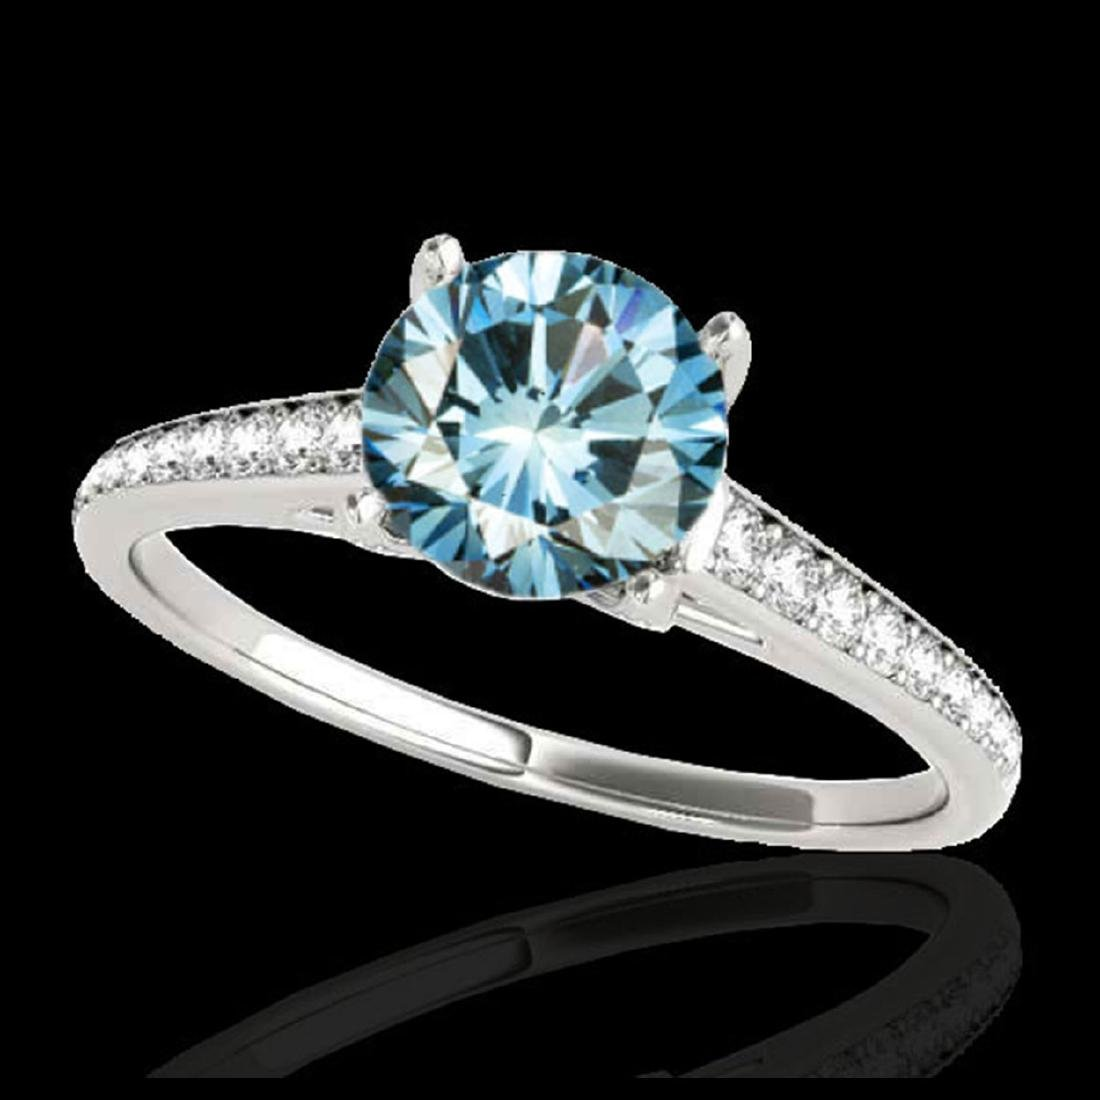 1.5 ctw SI Fancy Blue Diamond Solitaire Ring 10K White